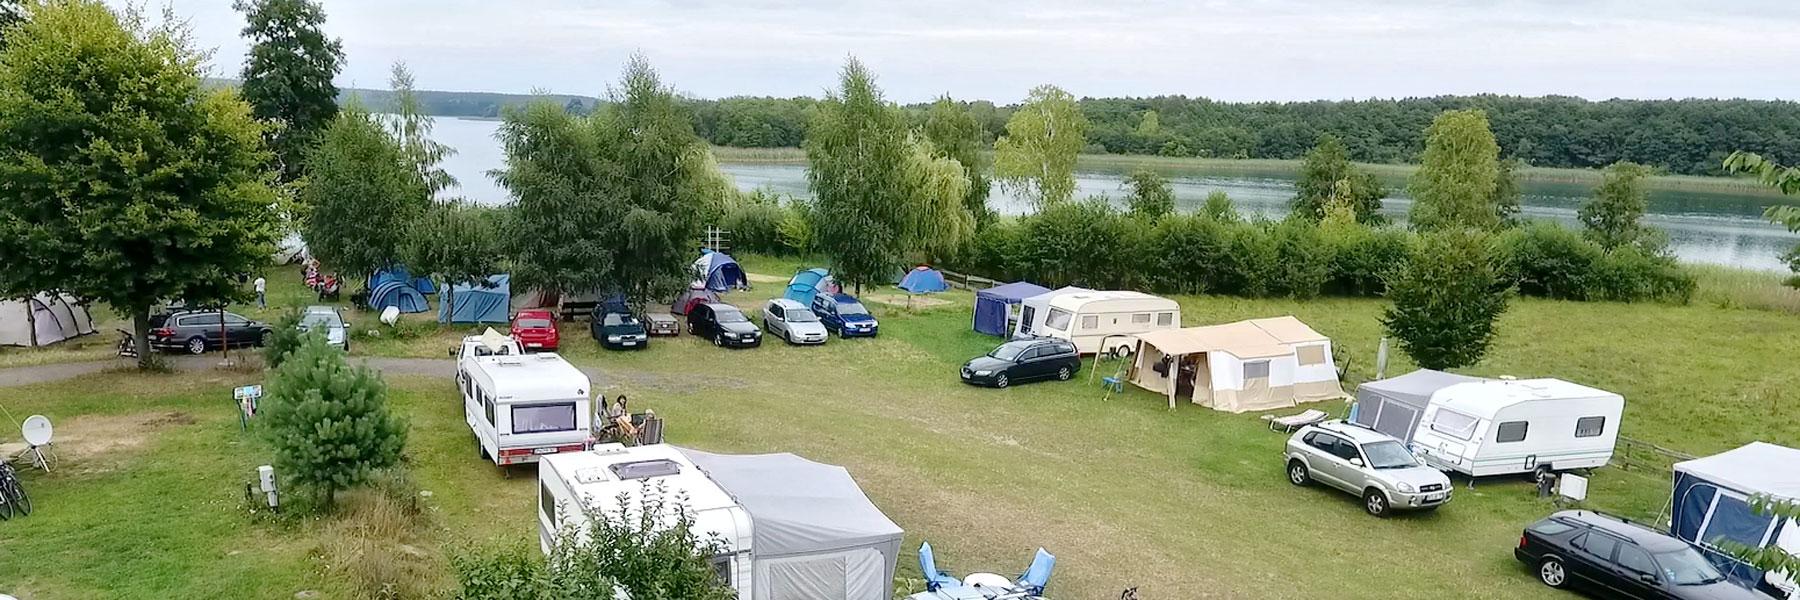 Stellplätze - Camping am Bauernhof